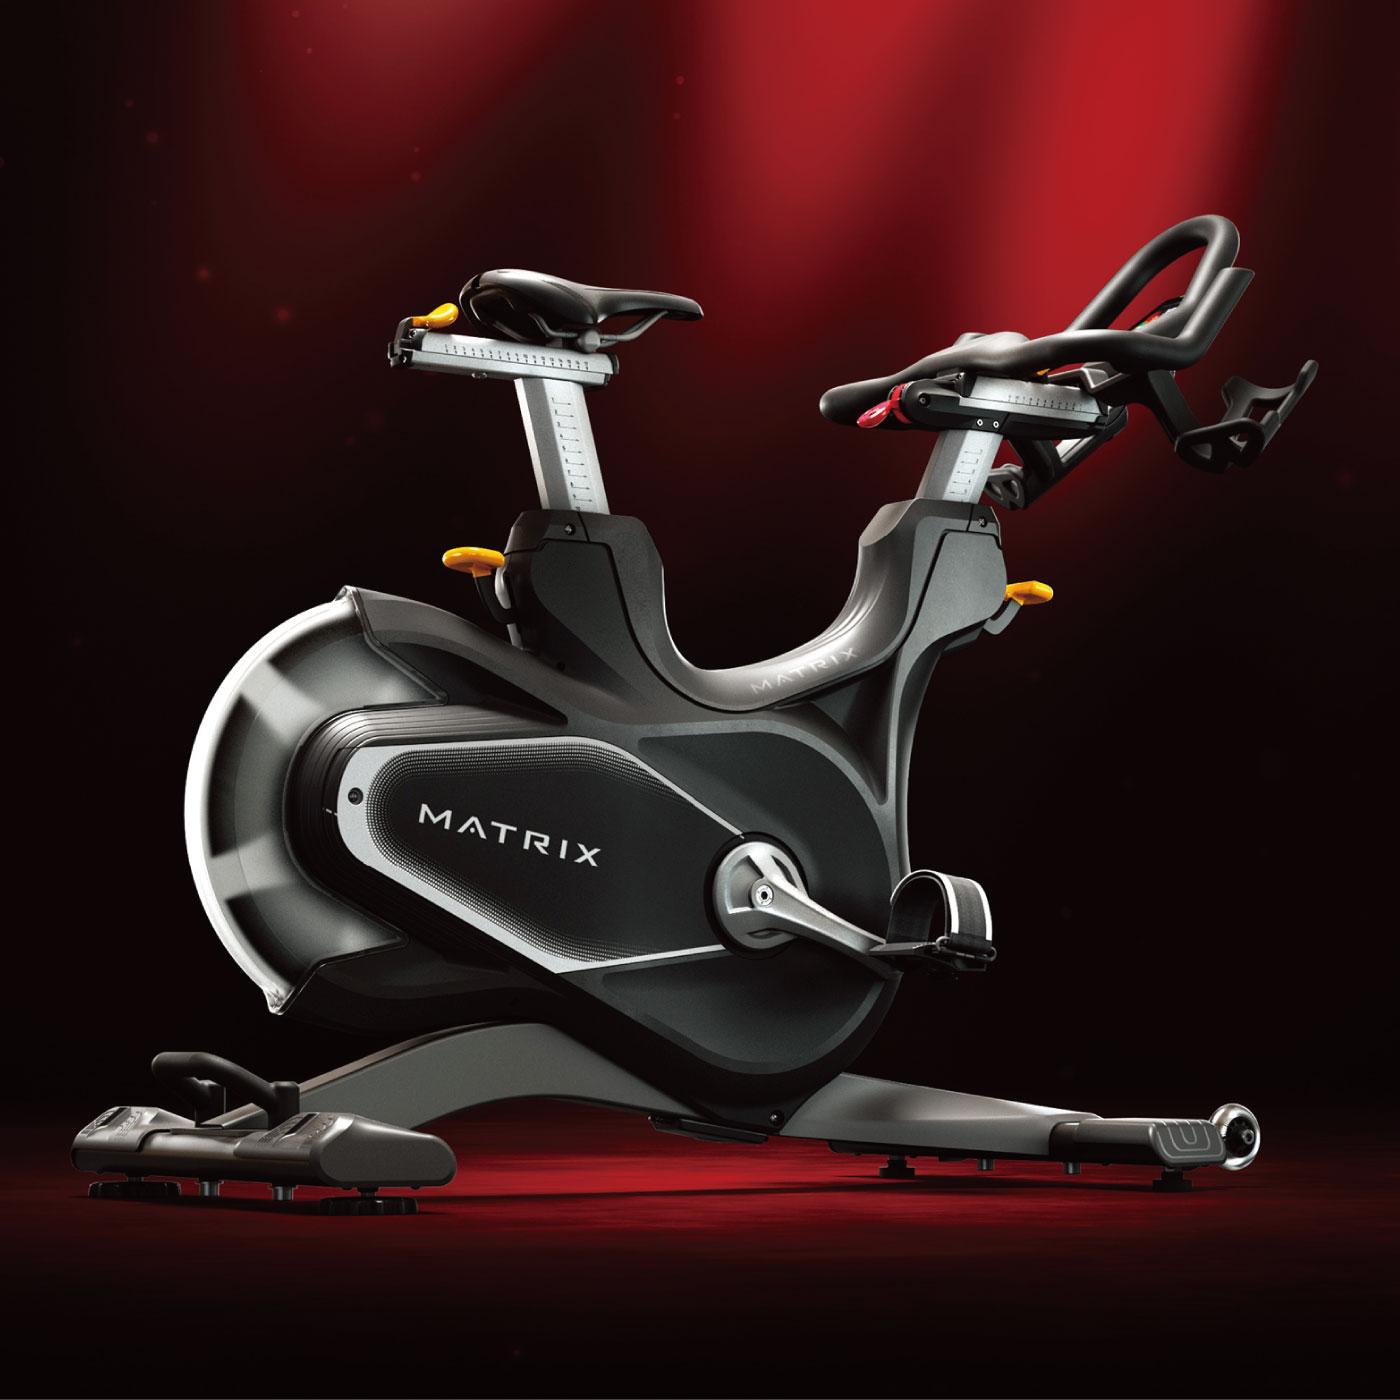 CXP/家庭用スピンバイク〈家庭用MATRIX〉《ジョンソンヘルステック》